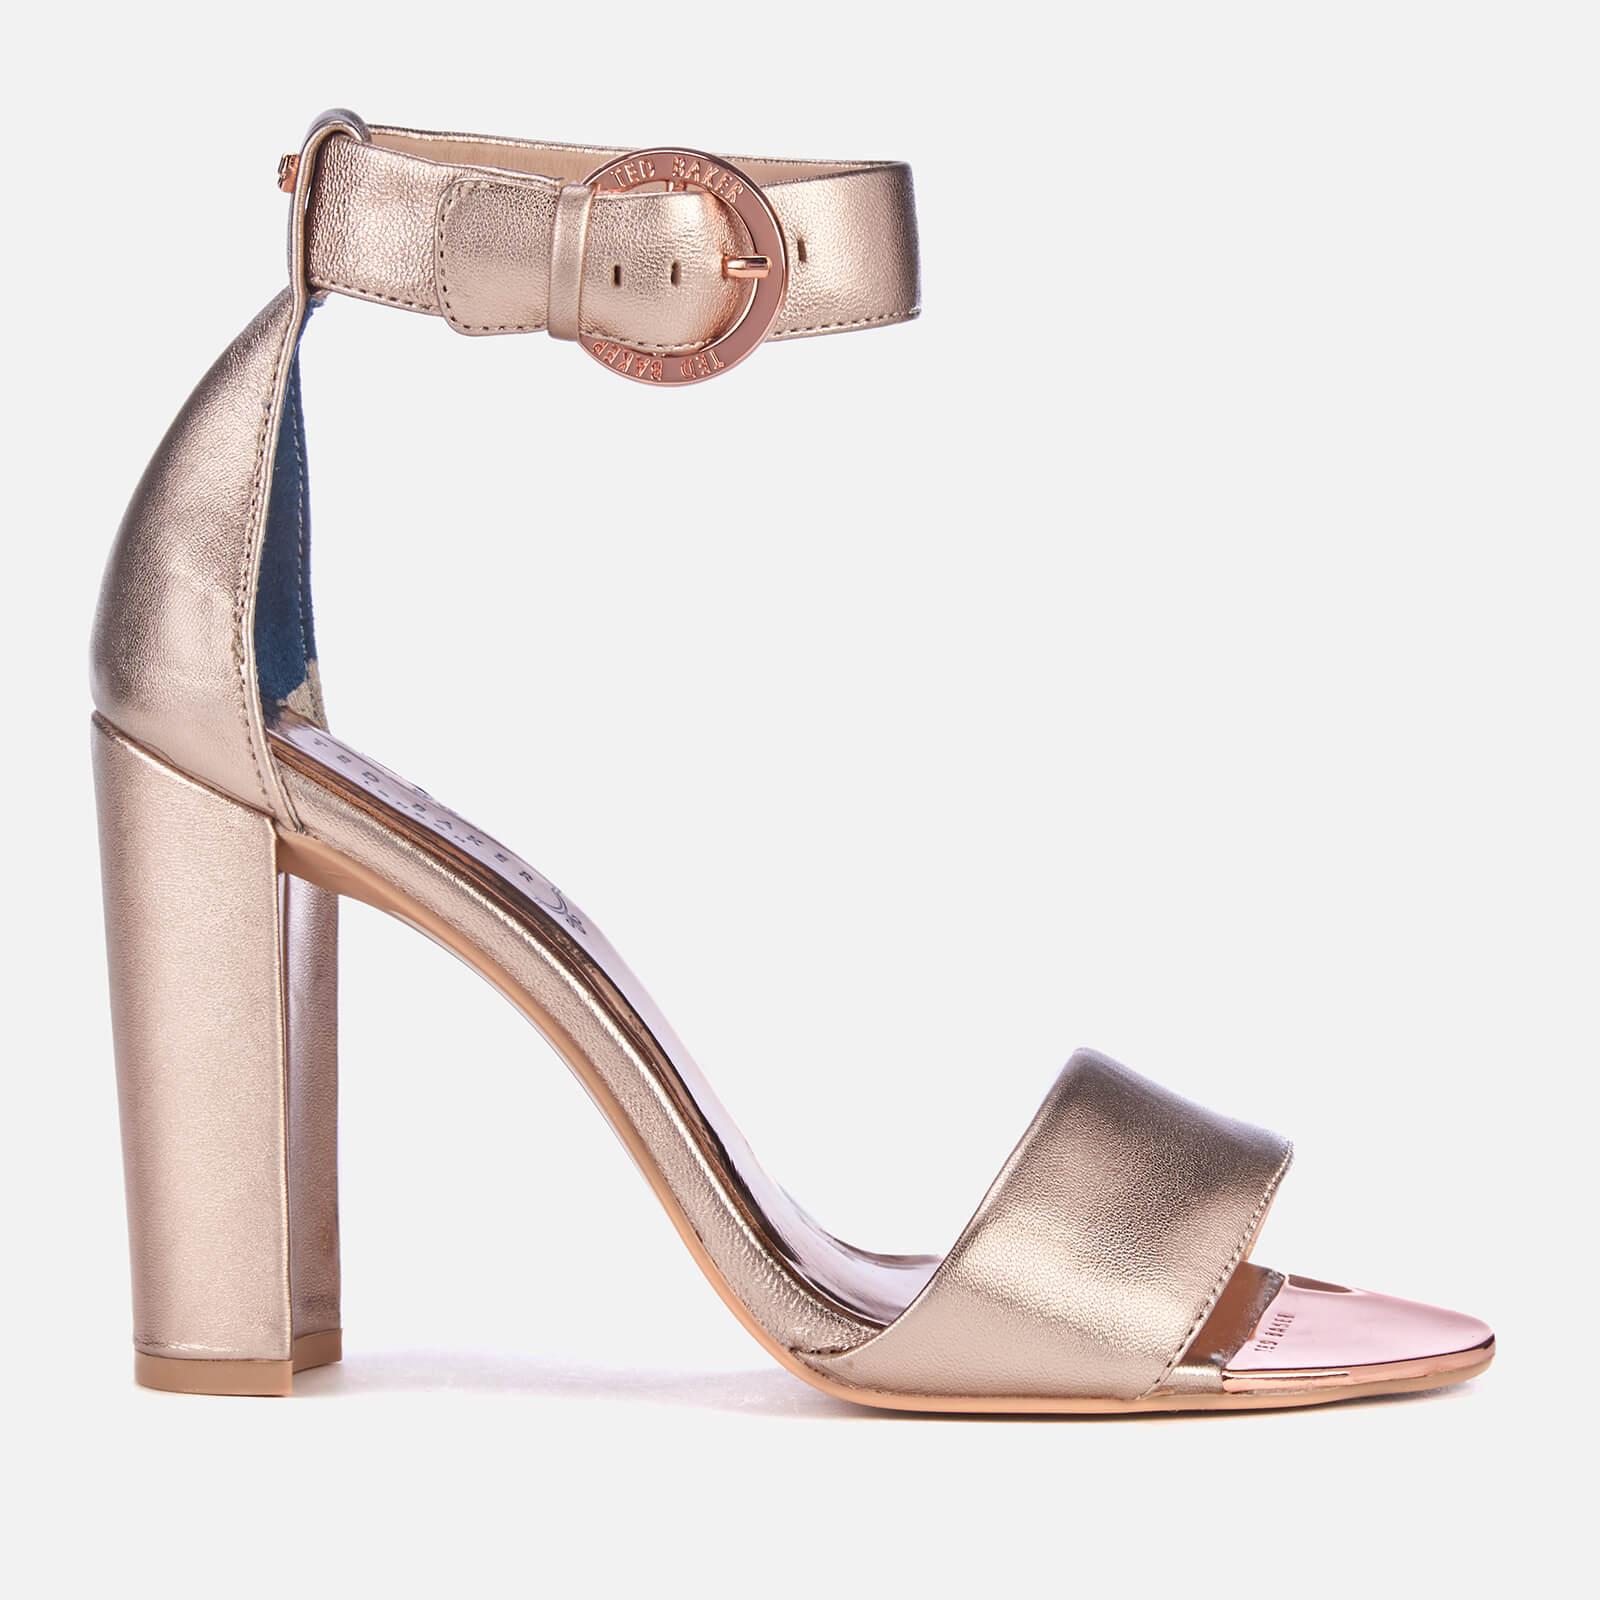 038dd0f136d7 Ted Baker Women s Secoal Block Heeled Sandals - Rose Gold Womens Footwear